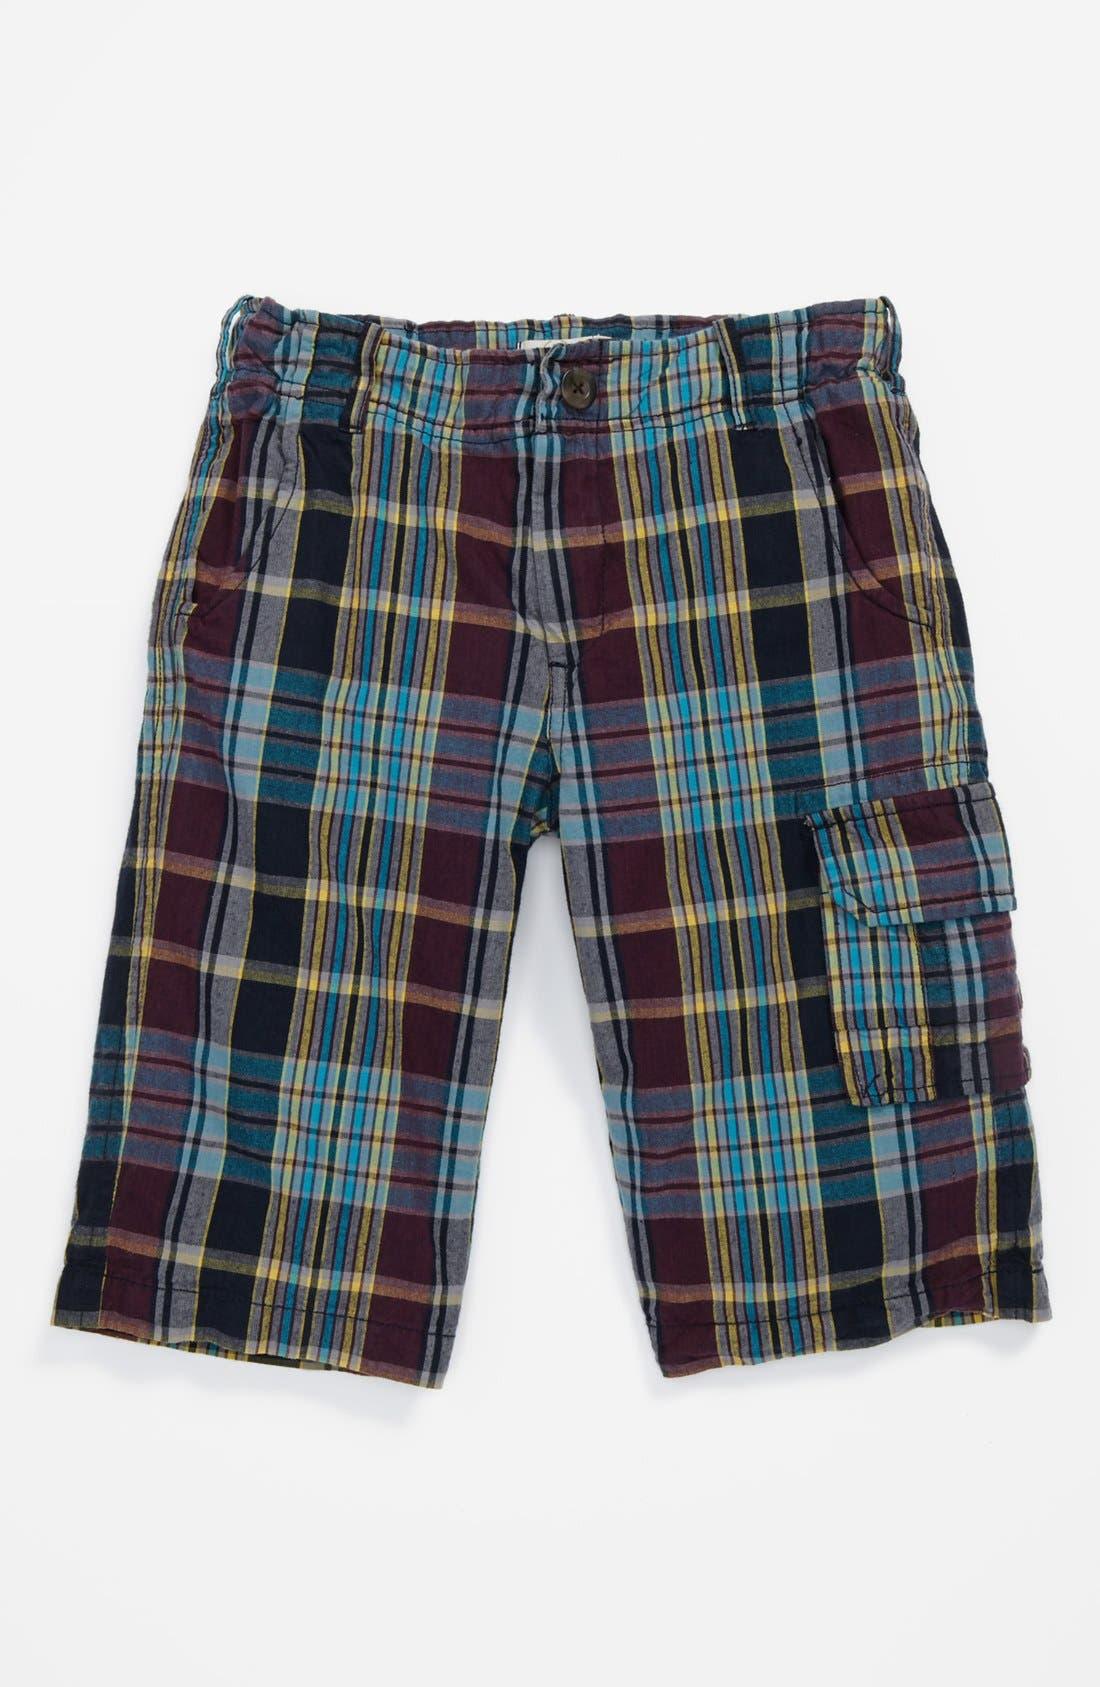 Main Image - Peek 'Sutter' Plaid Shorts (Toddler Boys, Little Boys & Big Boys)